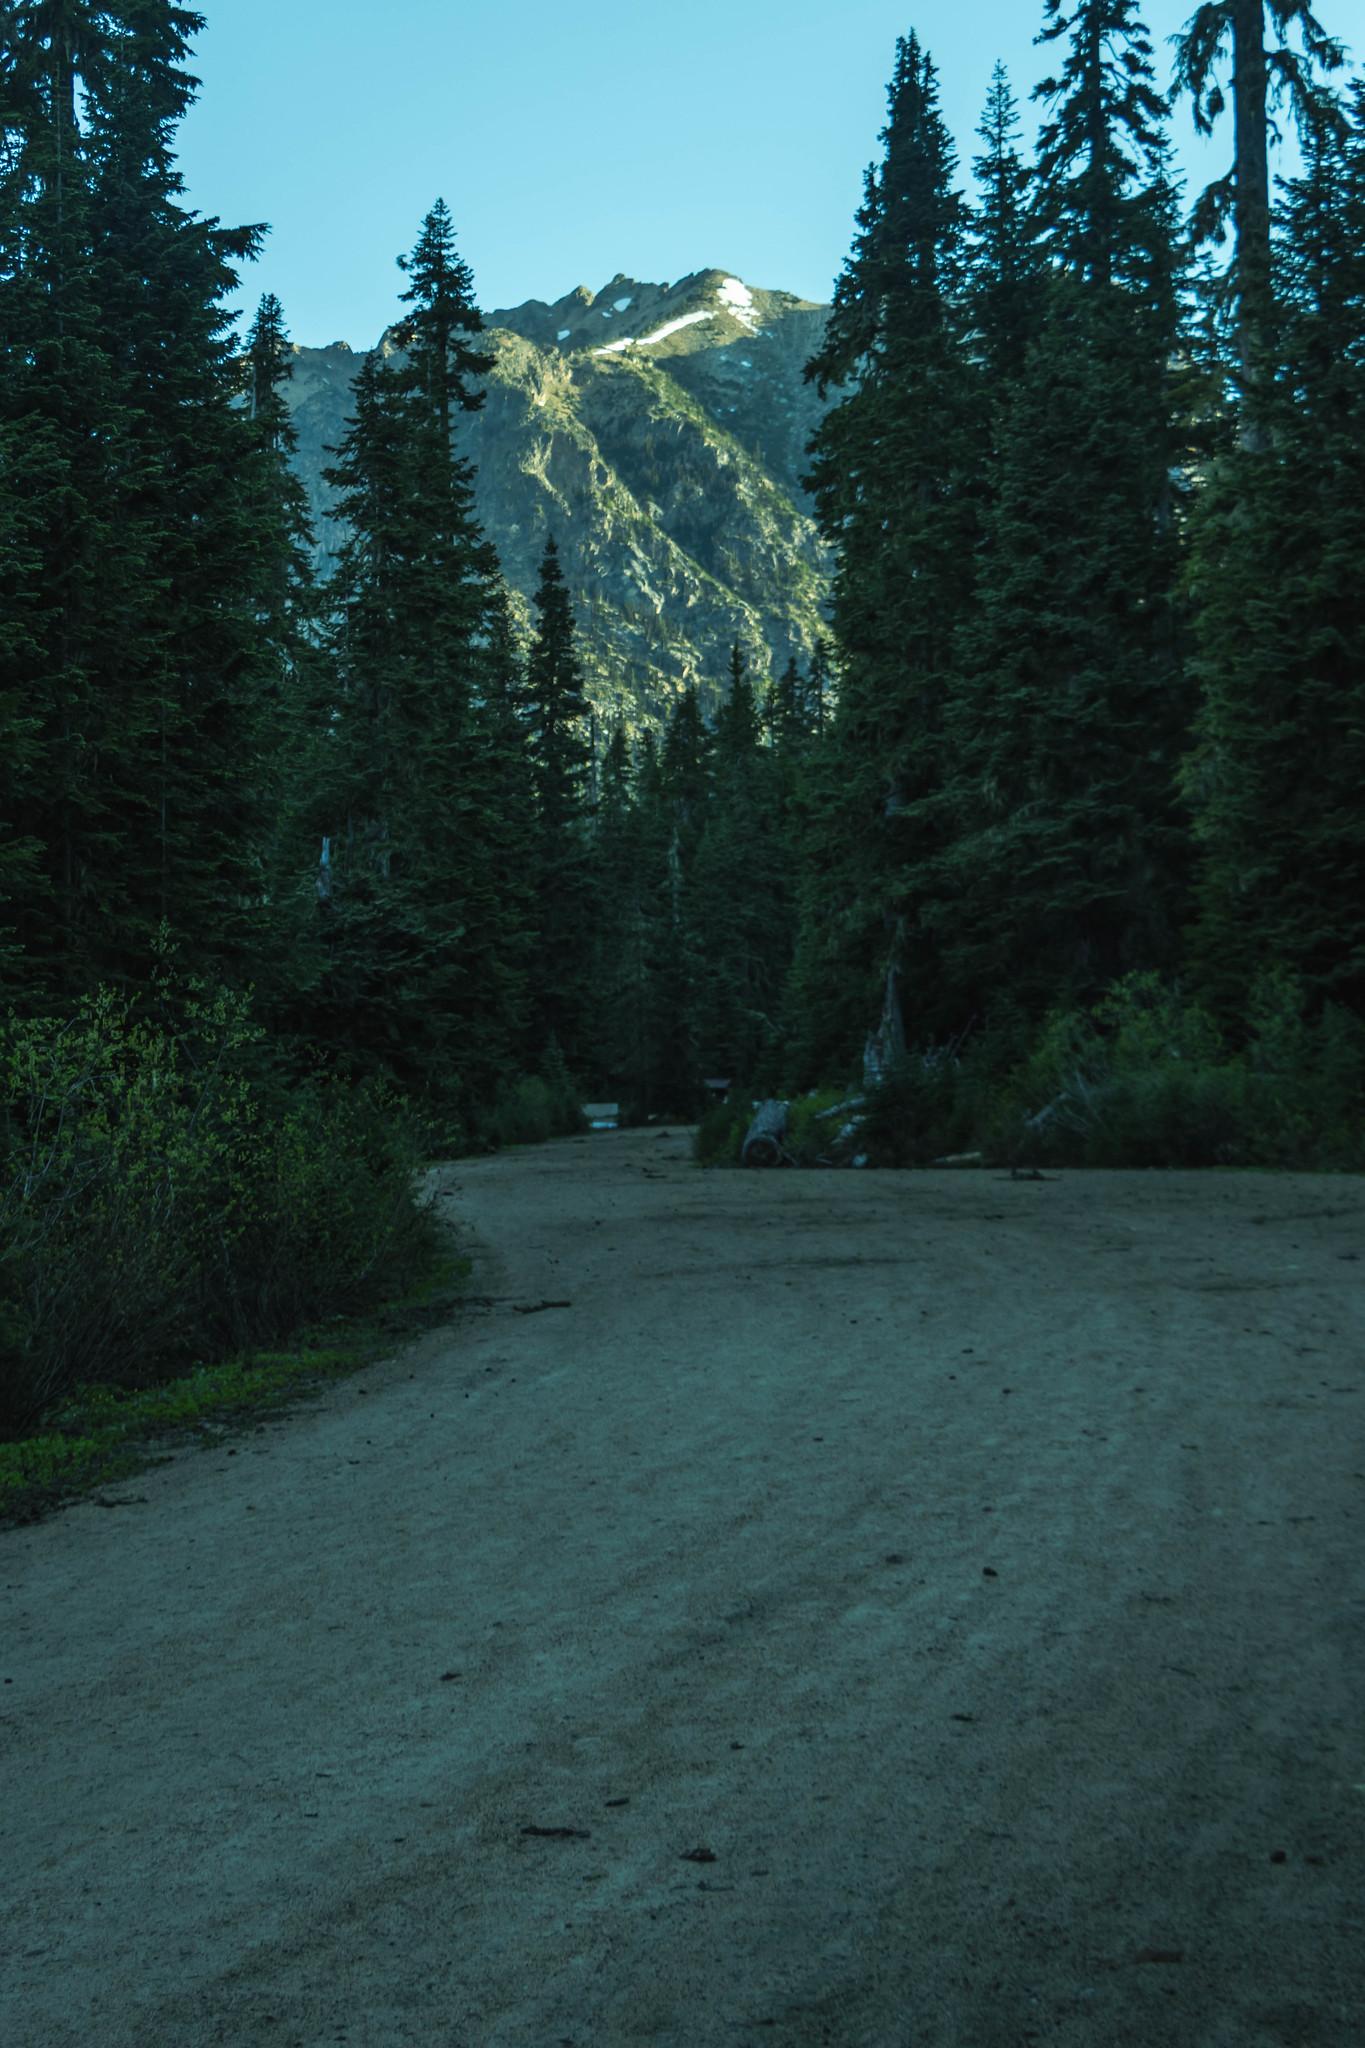 This way to Porcupine Peak